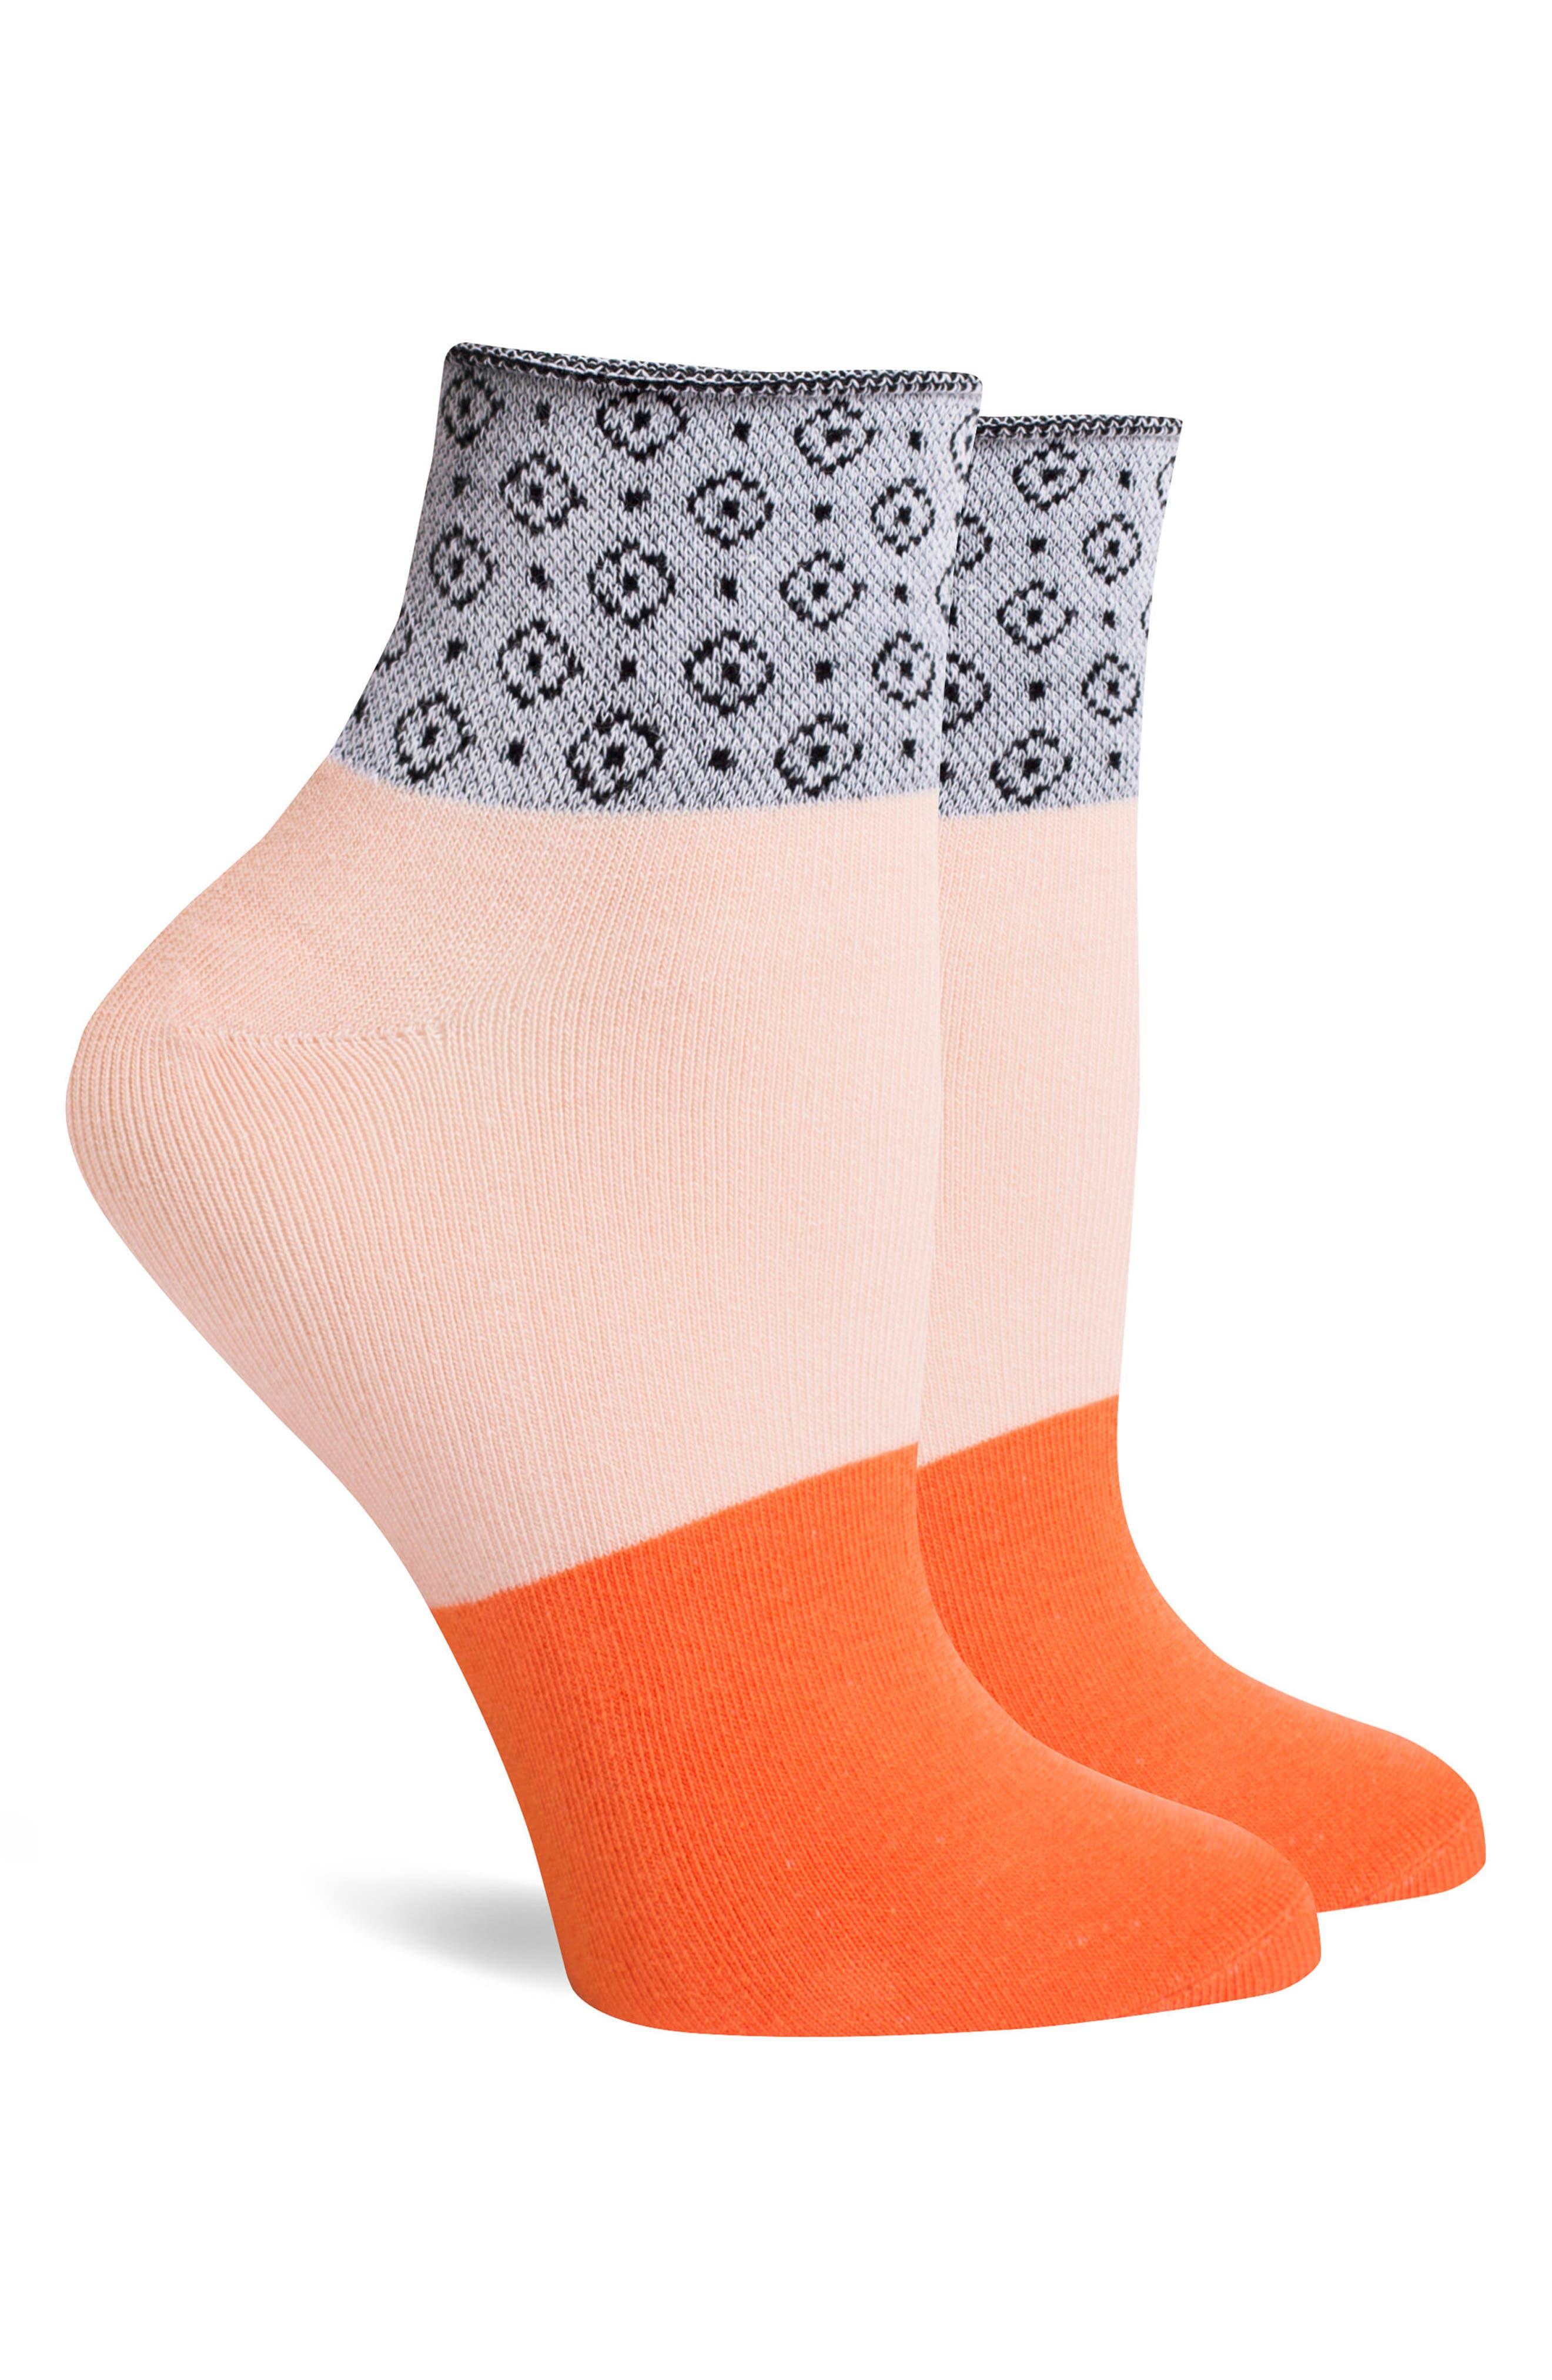 Celina Ankle Socks,                             Alternate thumbnail 4, color,